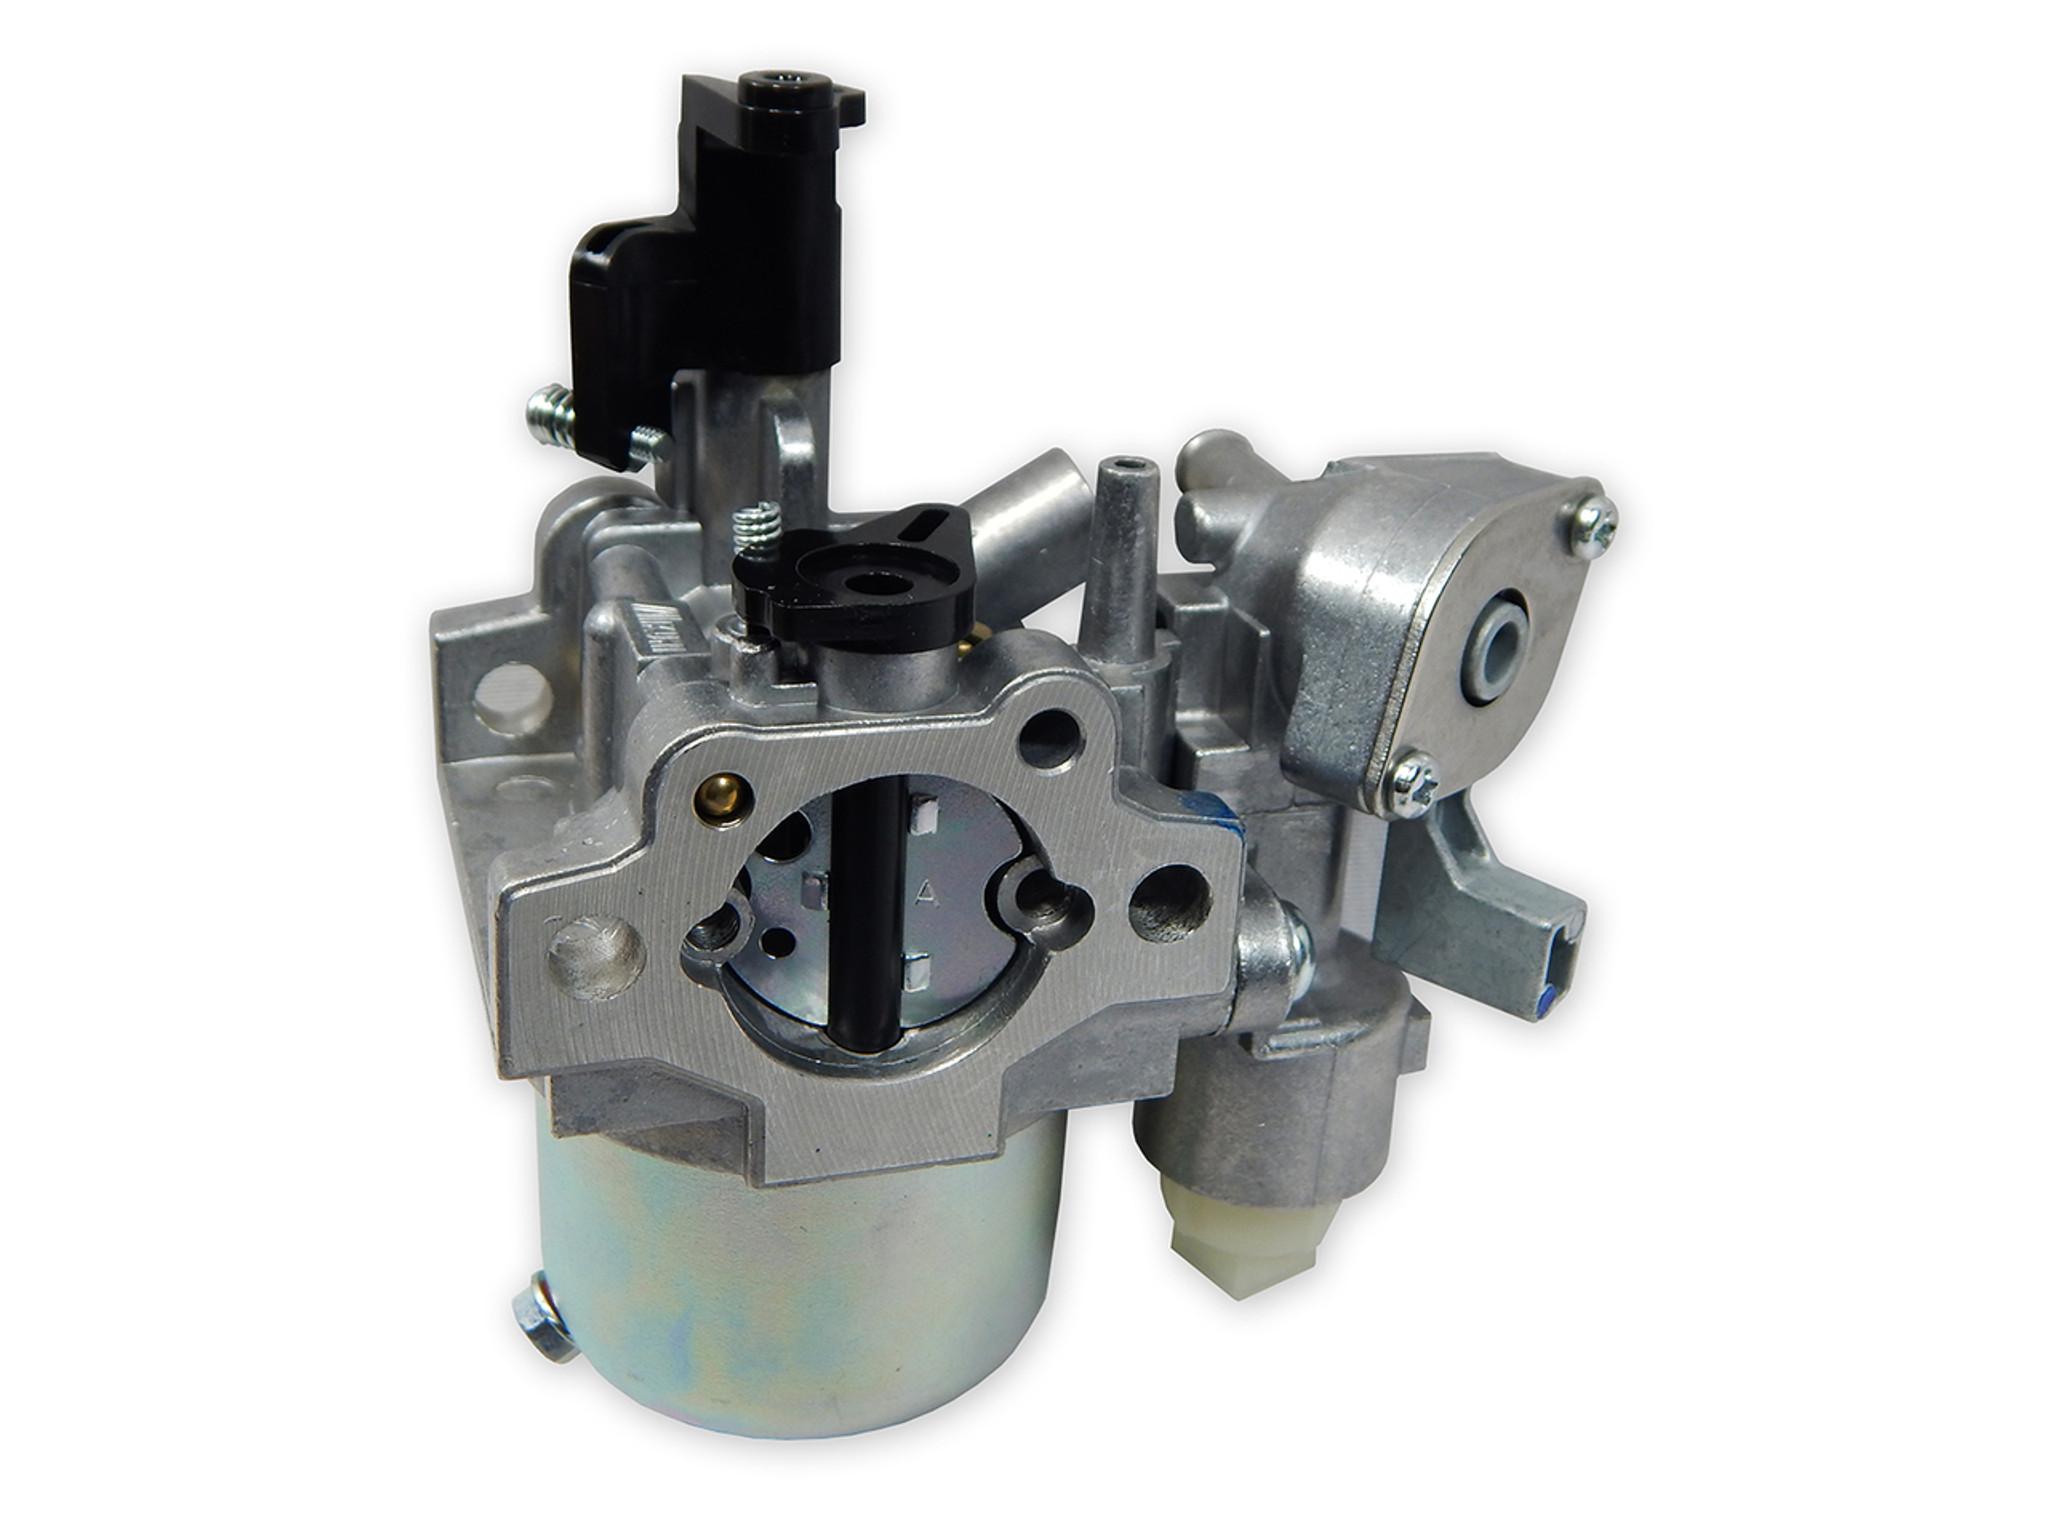 WM170 Carburetor   Wacker WP1540, WP1550, VP1340, VP1550, VP2050   0156534,  5000156534